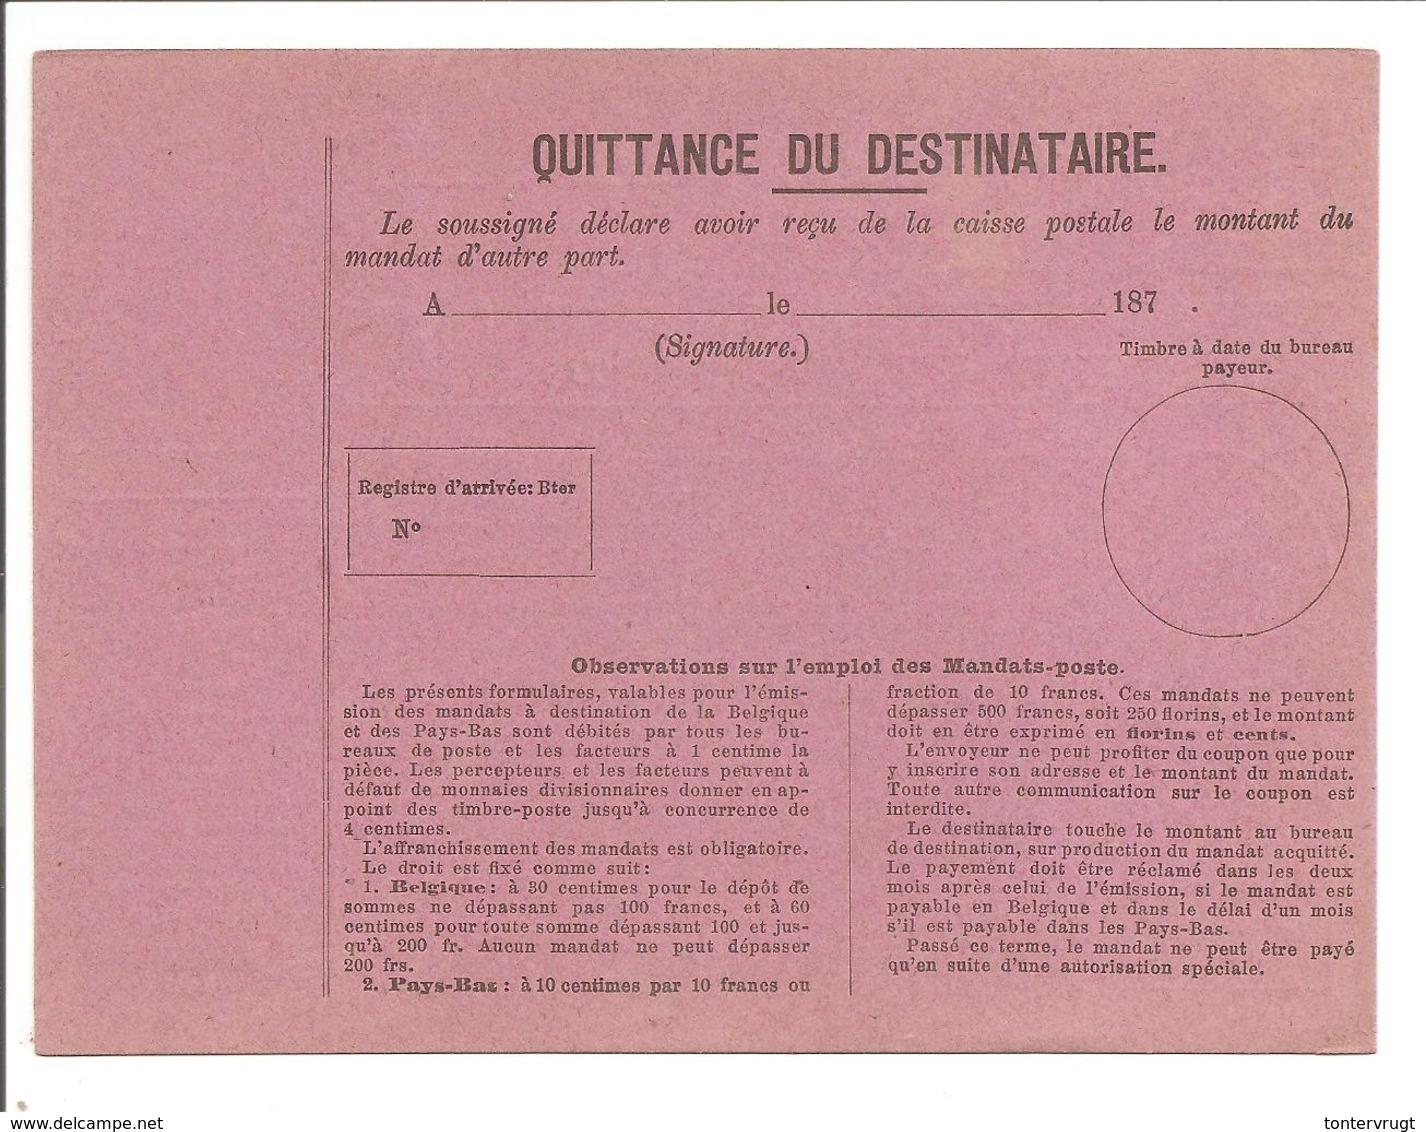 MANDAT-POSTE INTERNATIONAL Q. - Ganzsachen